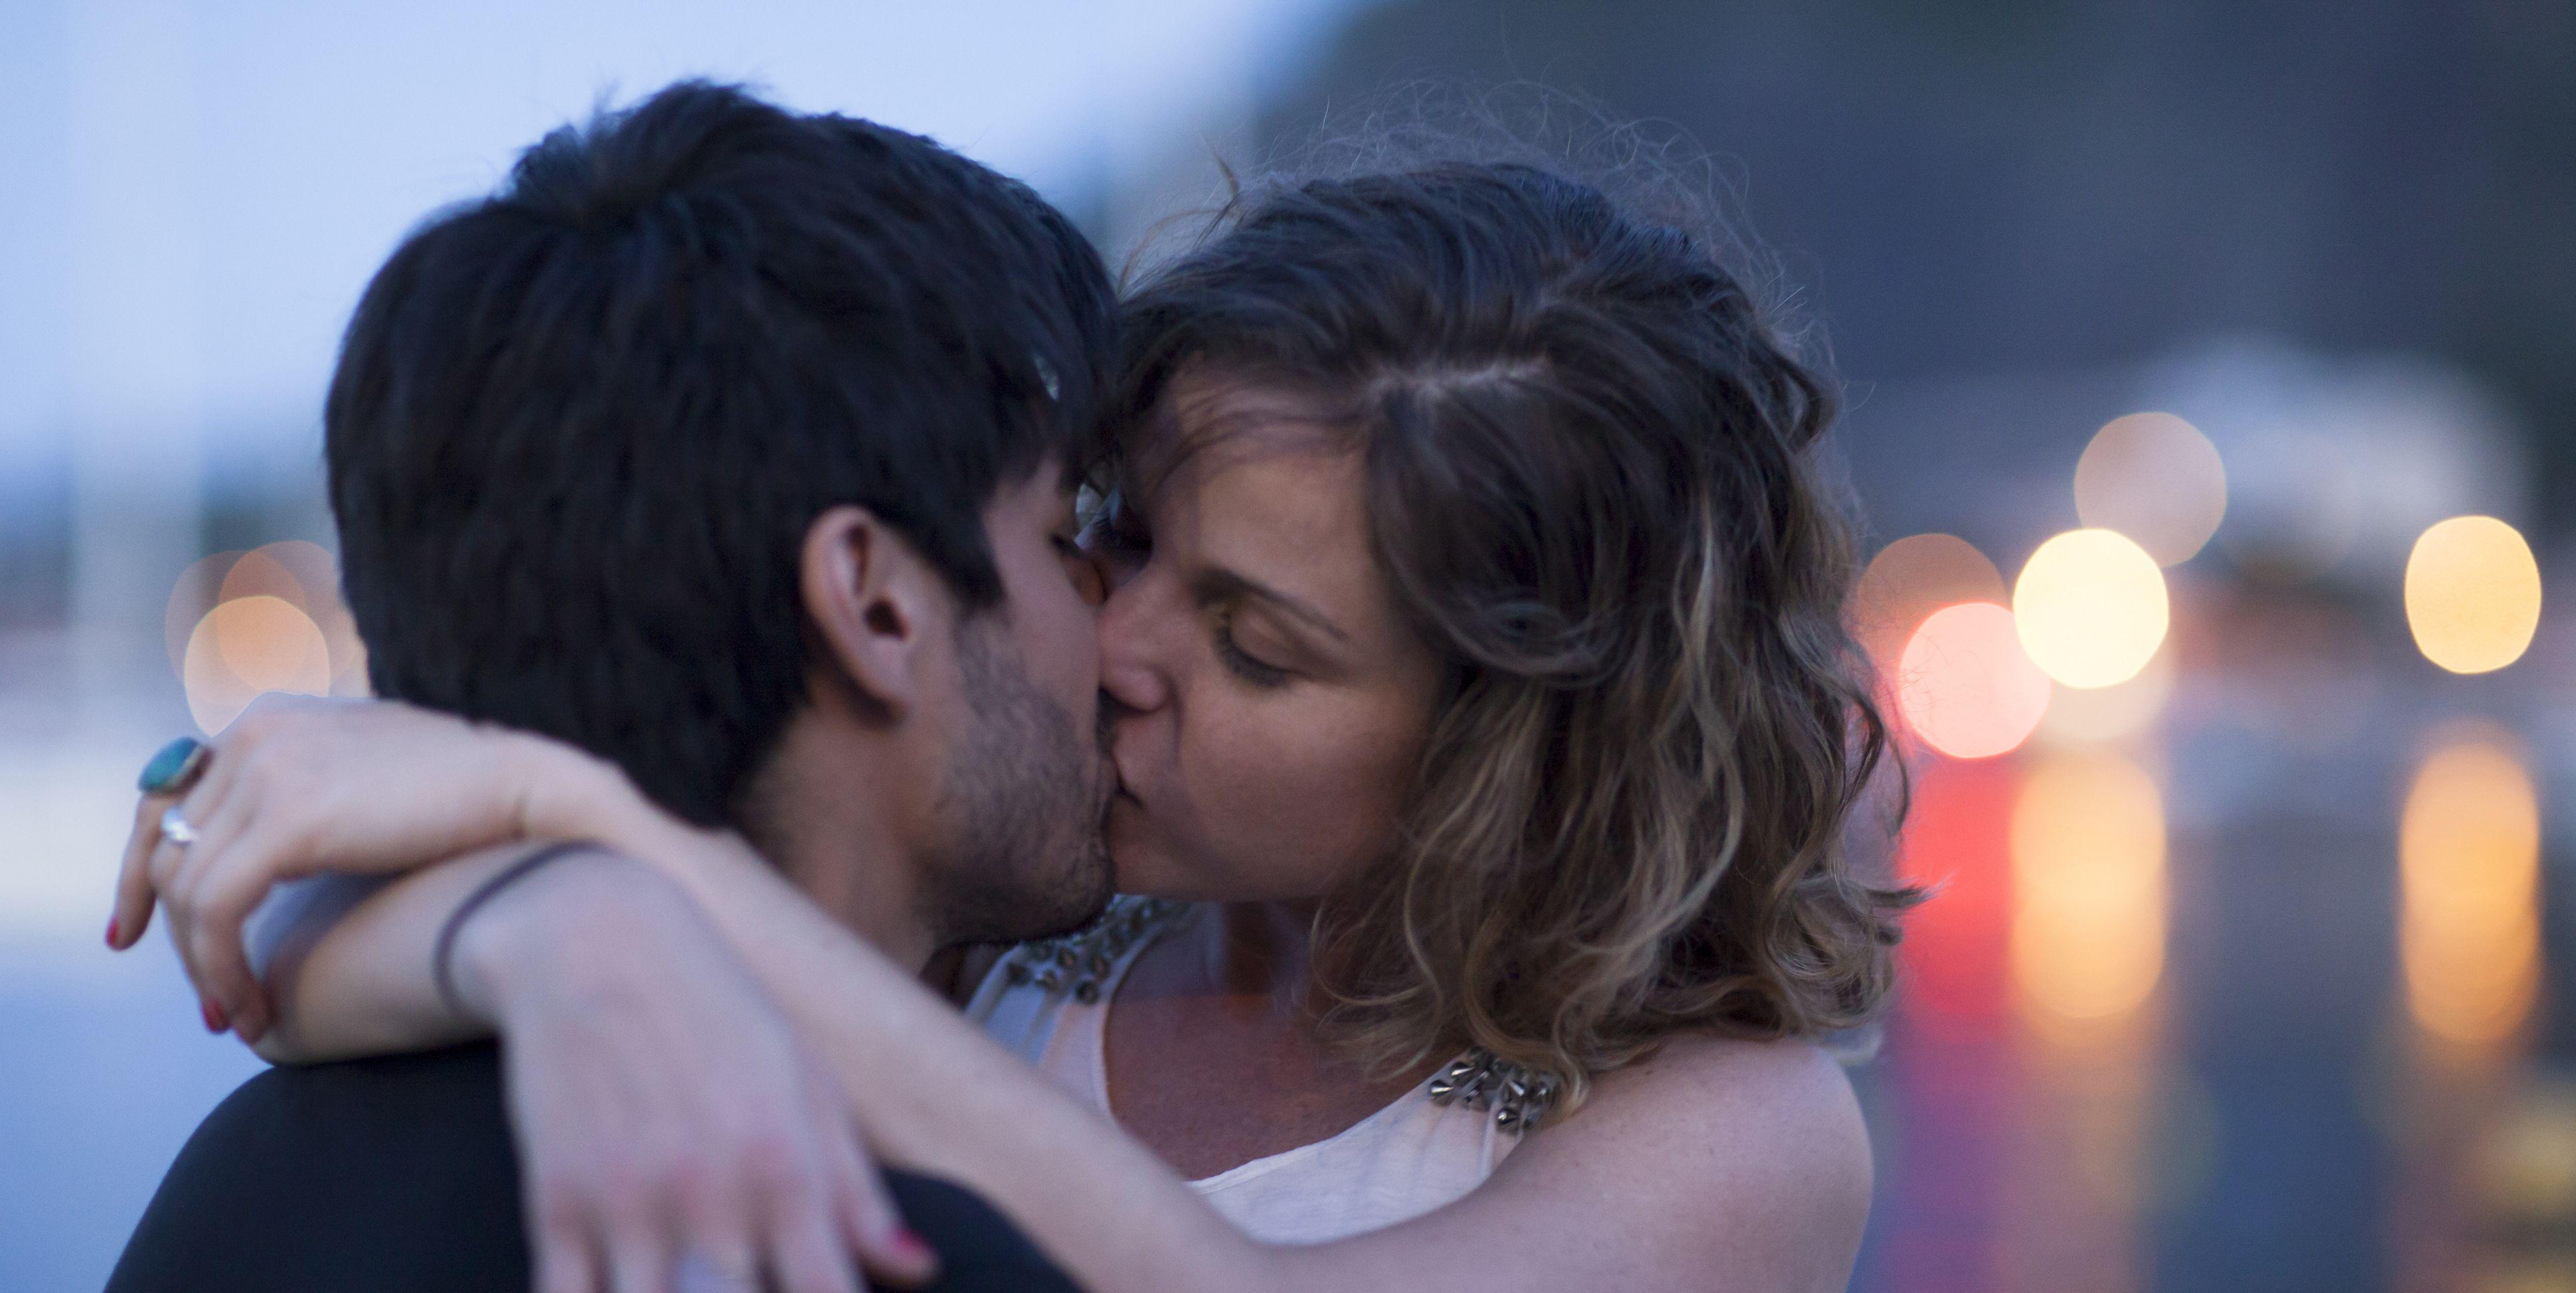 Young brazilian couple kiss at Dusk